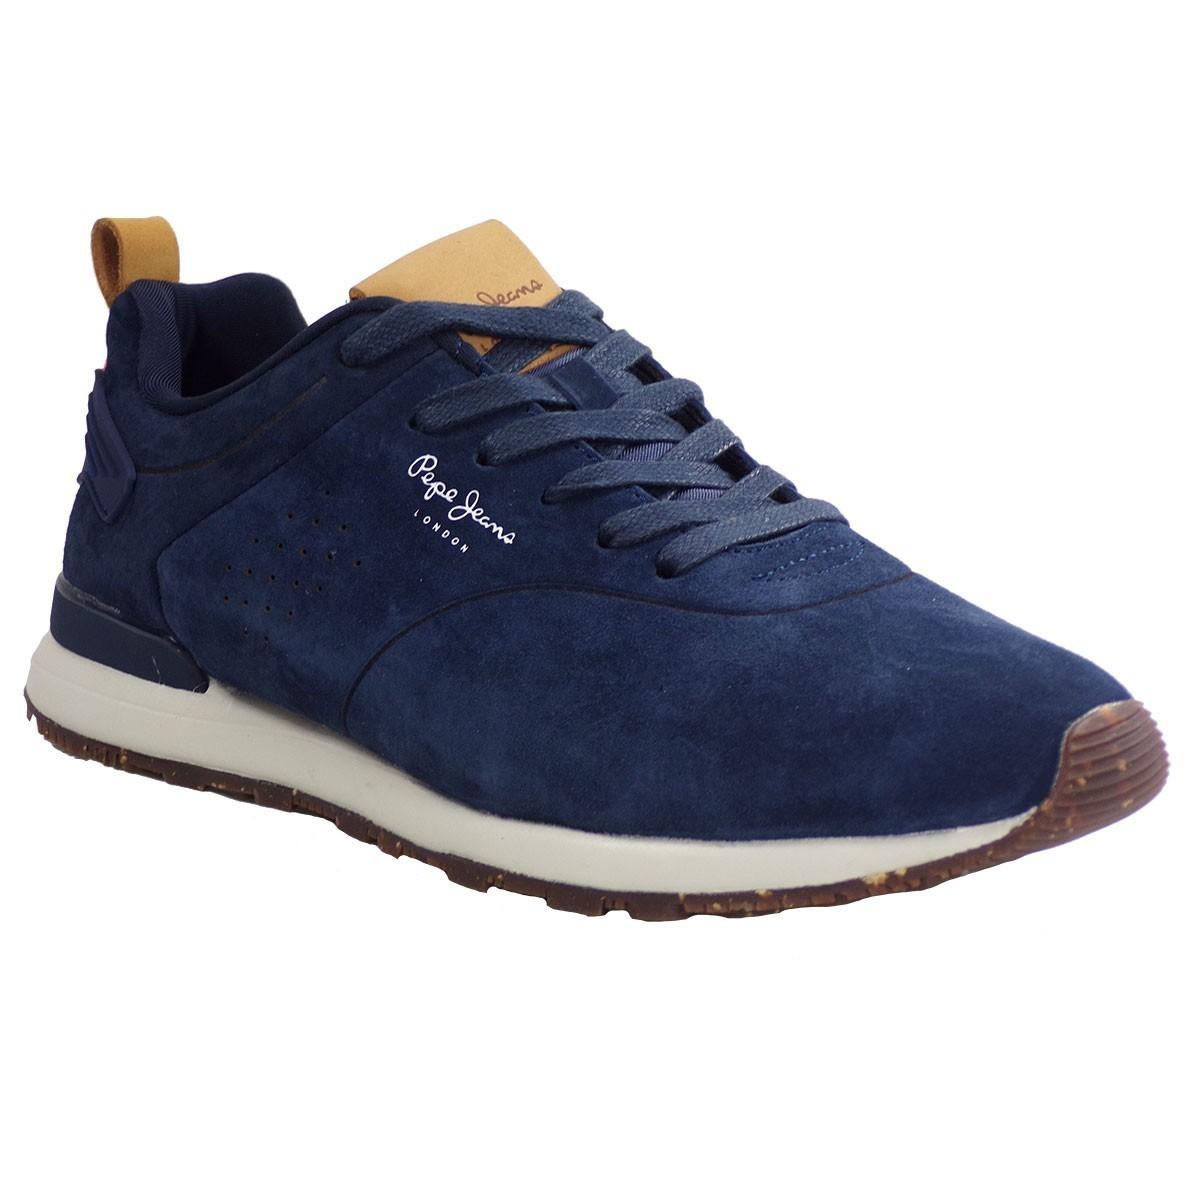 b9dbd09db71 Pepe Jeans BOSTON SMART Sneakers Ανδρικά Παπούτσια PMS30520-595 Μπλέ ...